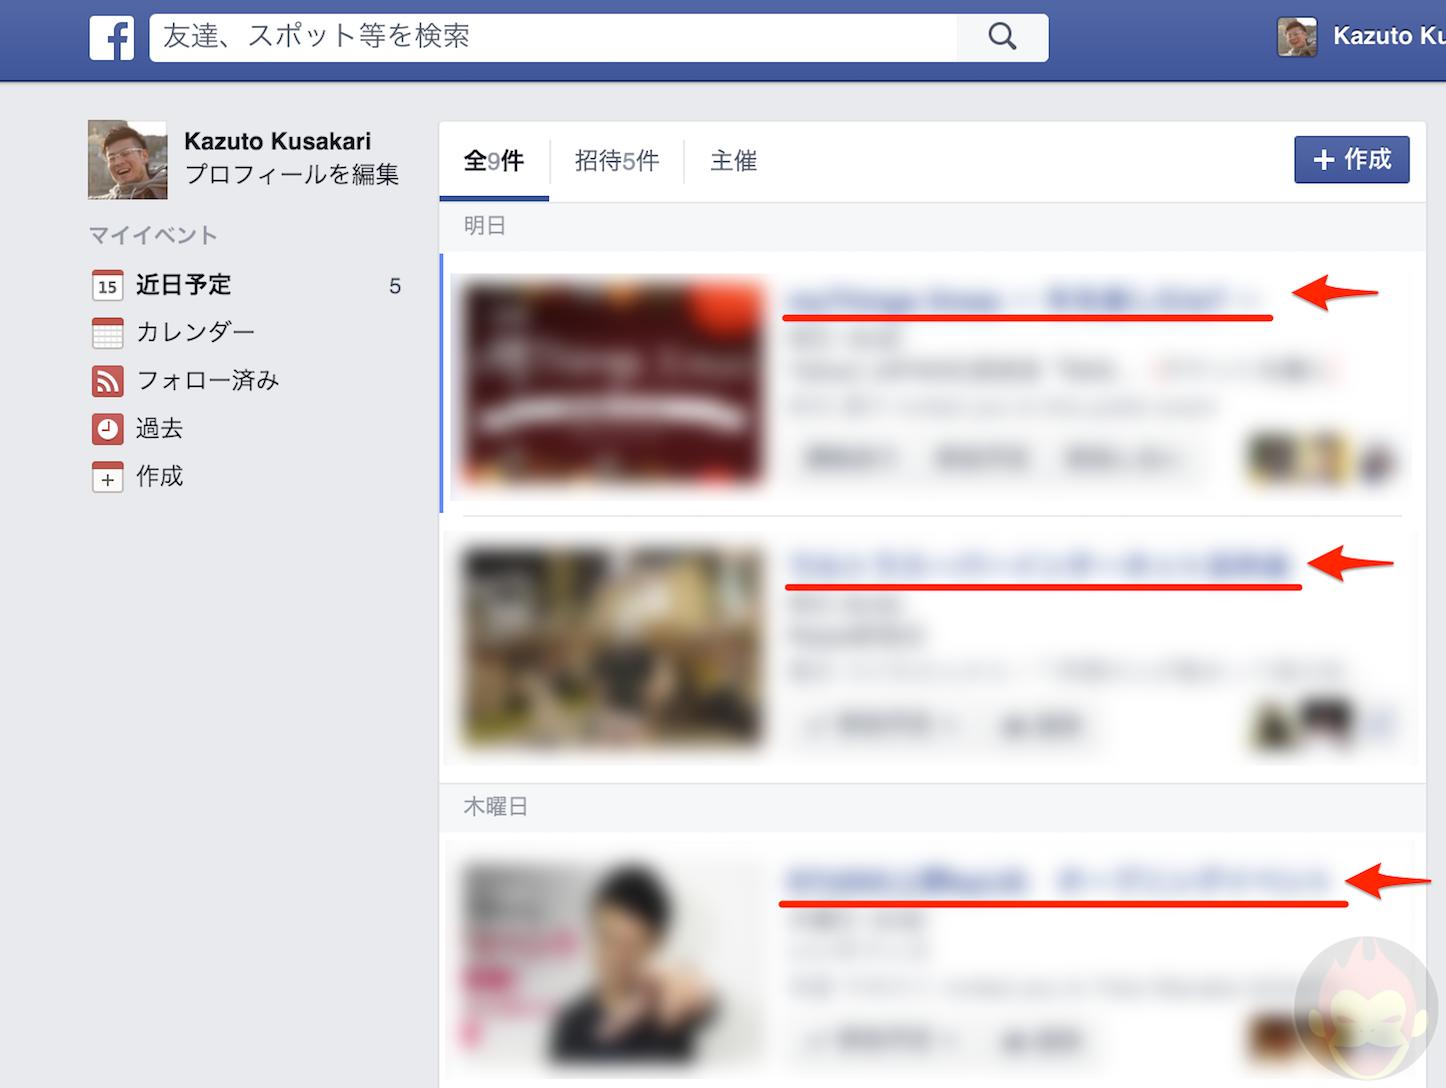 Adding-Facebook-Events-To-Google-Calendar-02.png